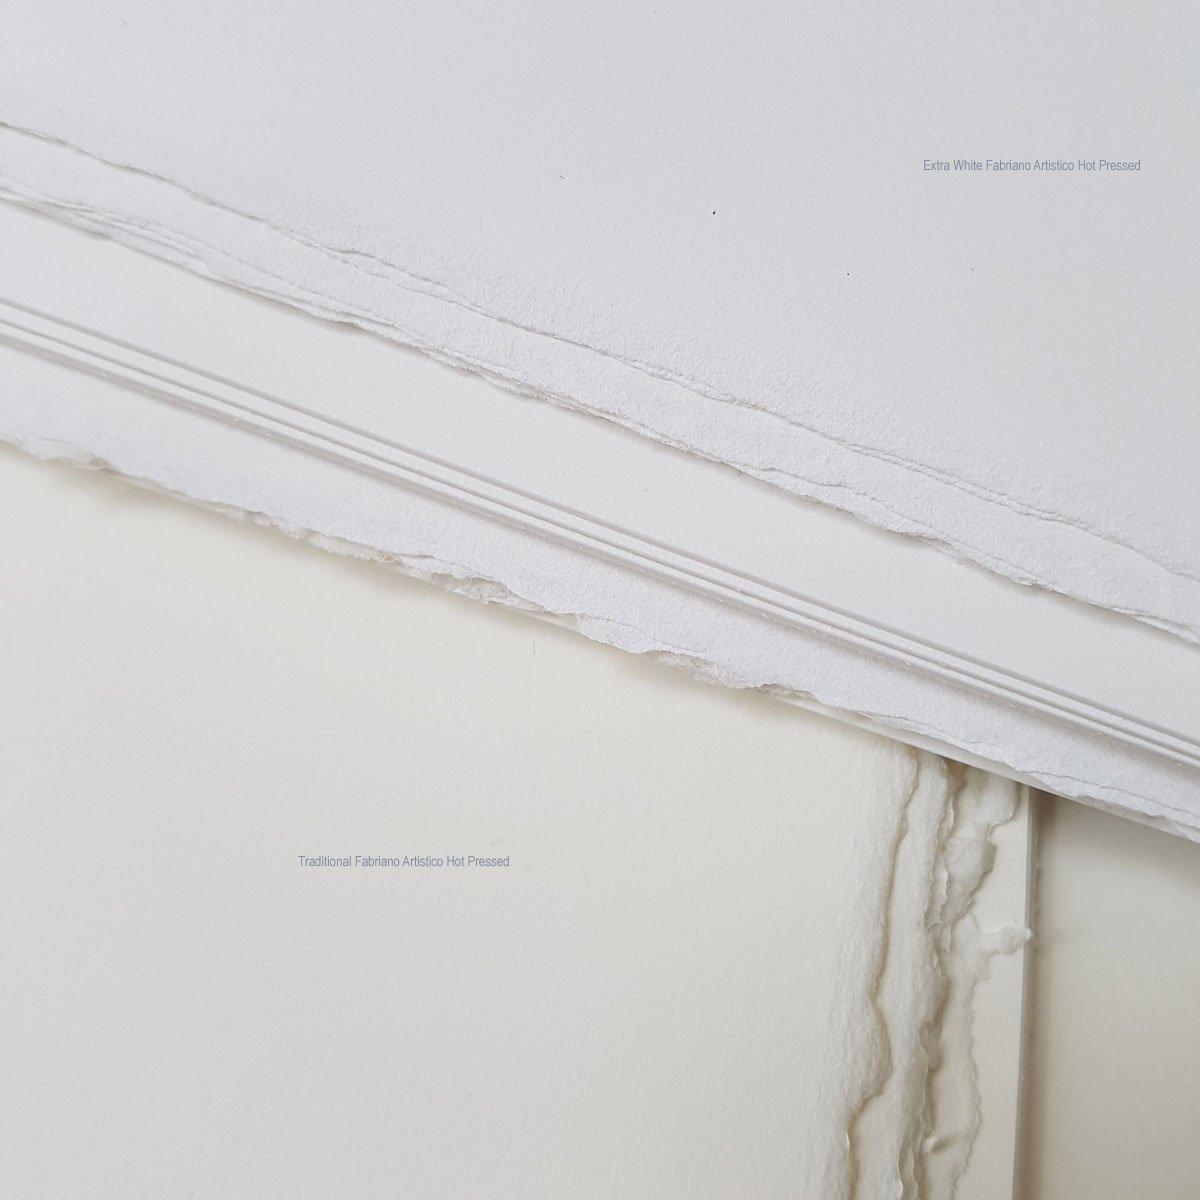 Fabriano Extra White Artistico Hot Pressed Watercolour Paper 380x280mm 20 Sheet